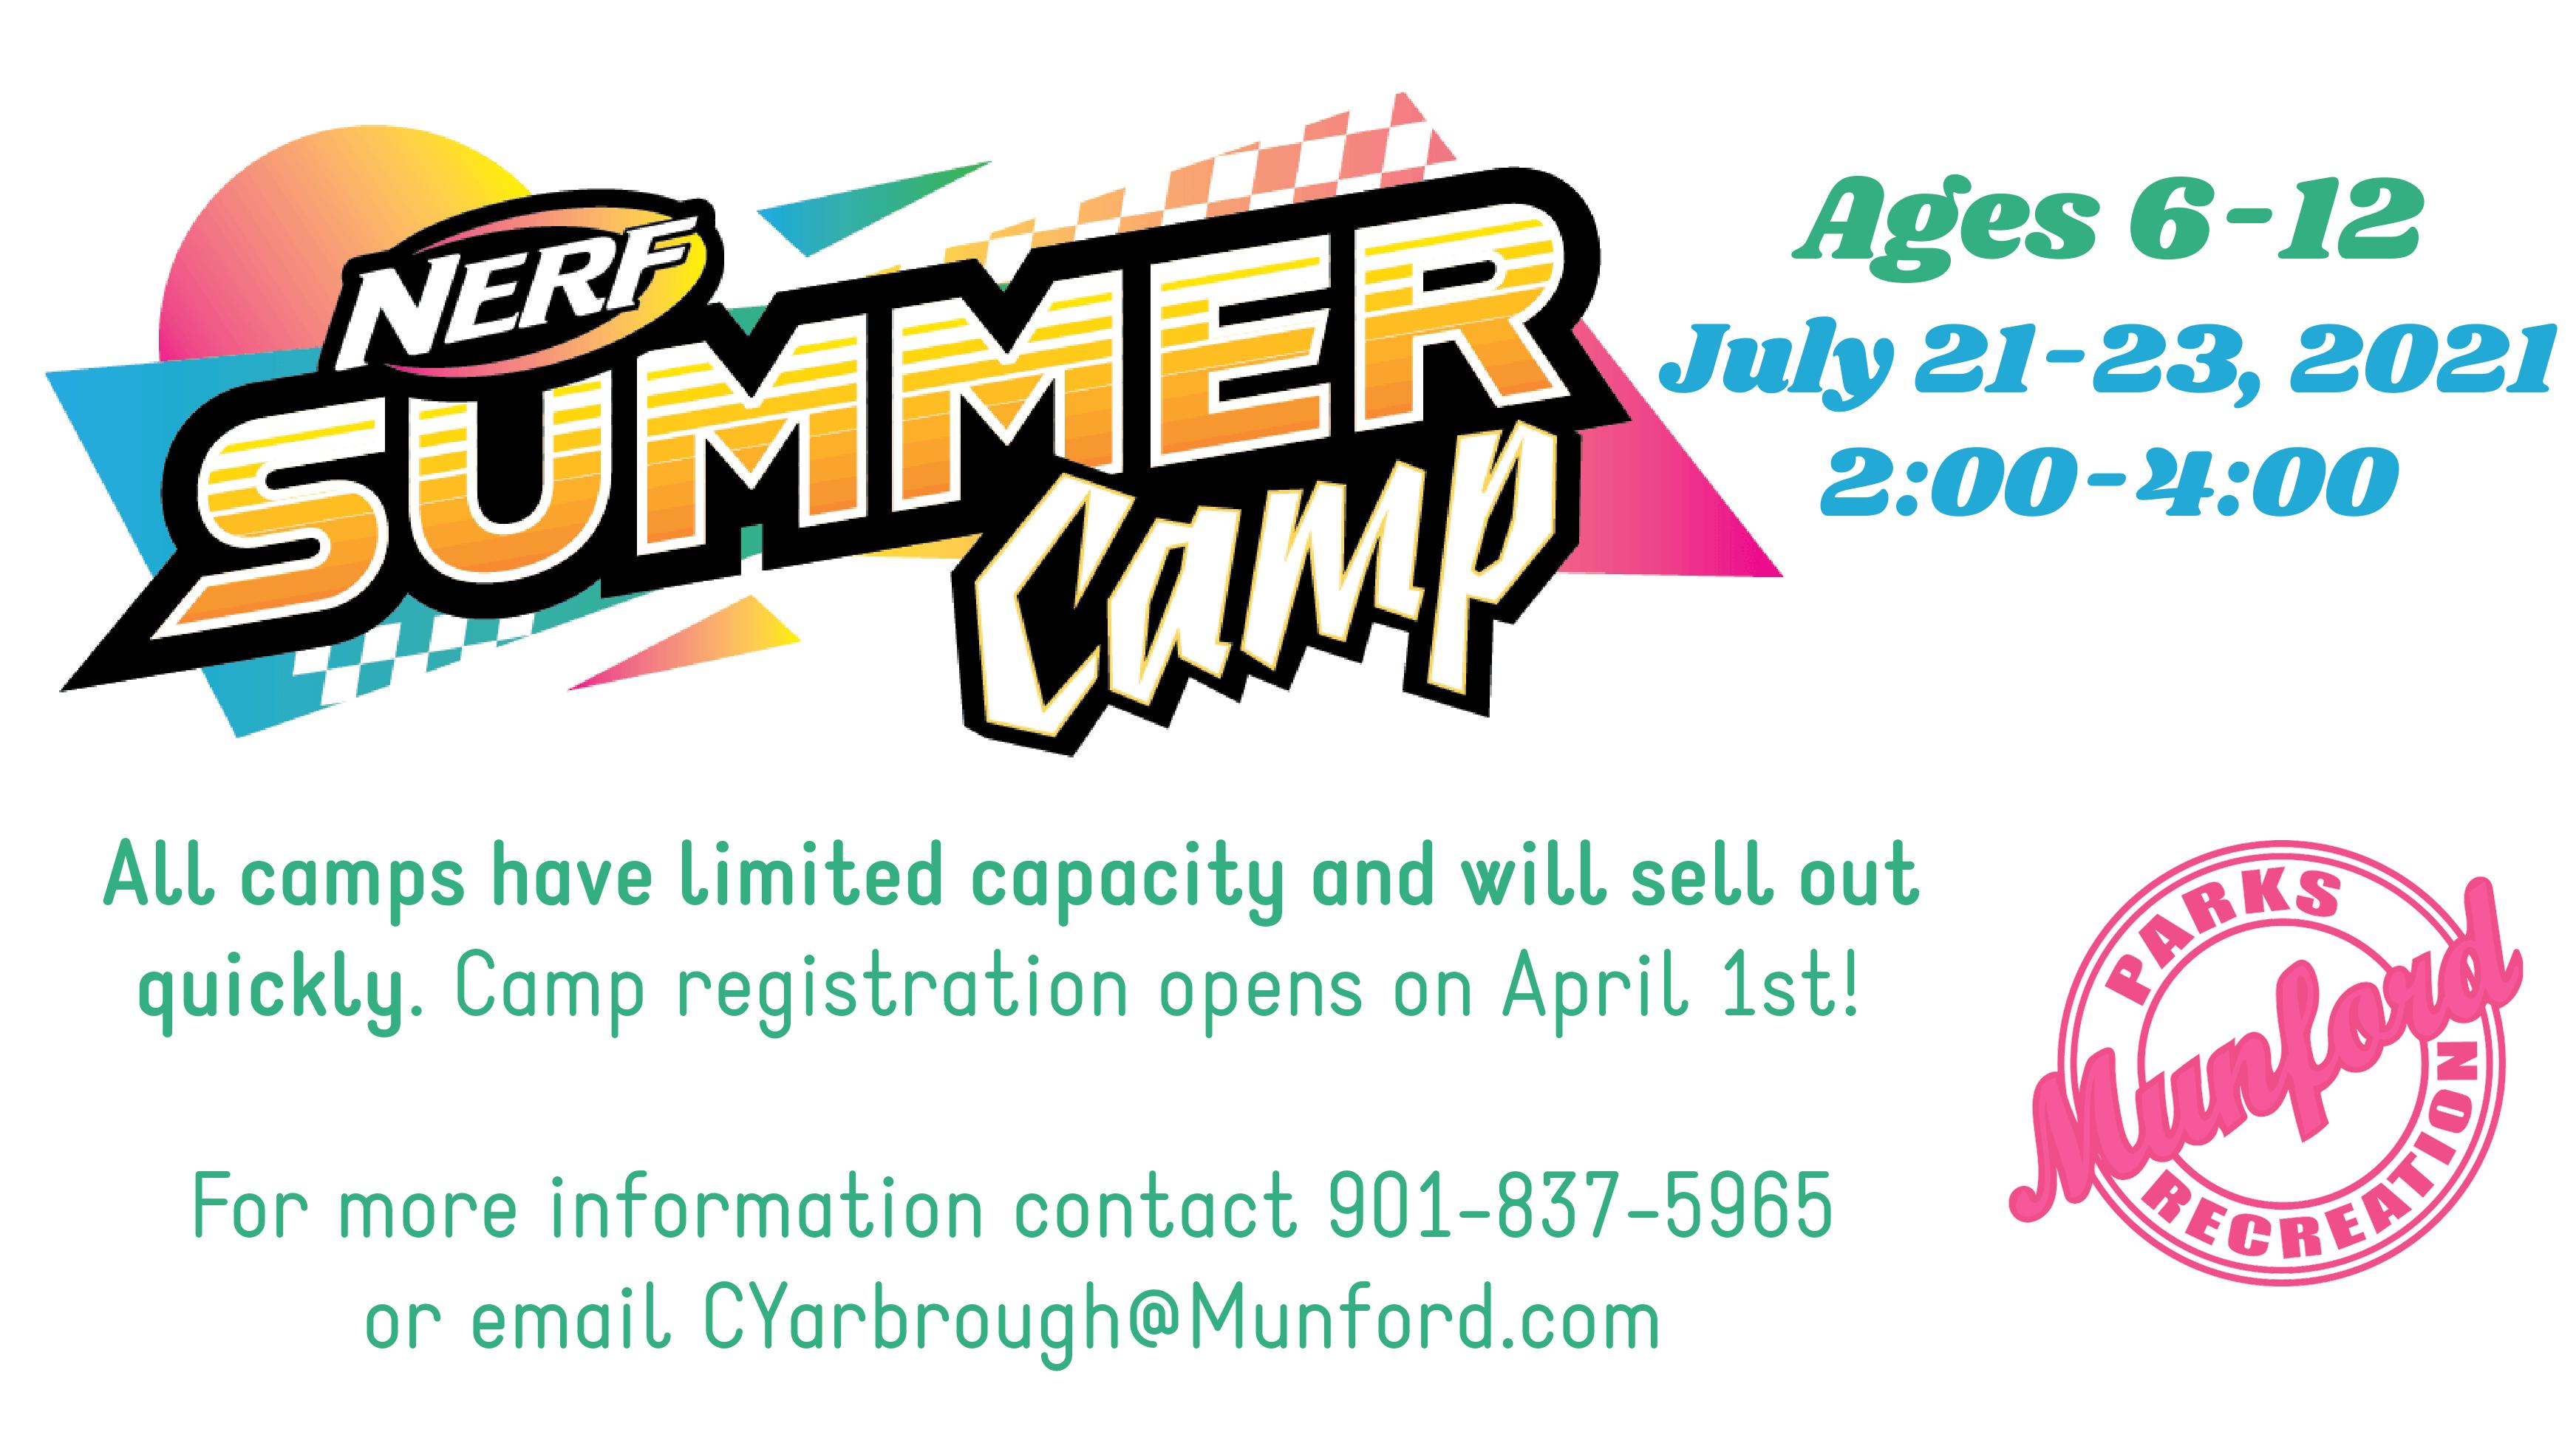 Nerf Summer Camp